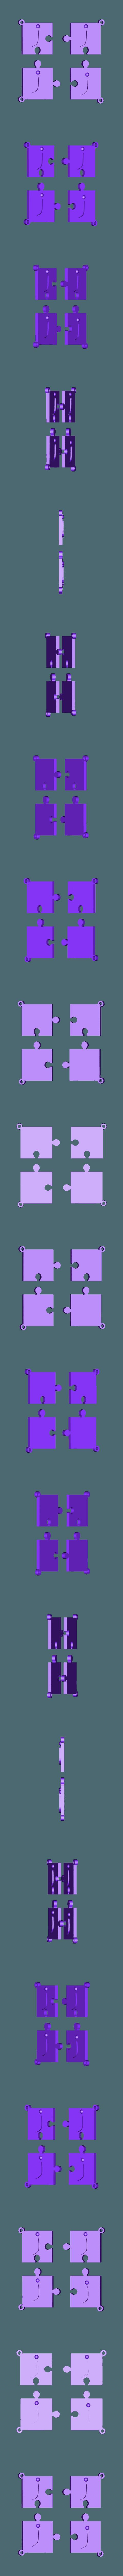 puzzle j.stl Download STL file puzzle key ring • 3D printing design, catf3d